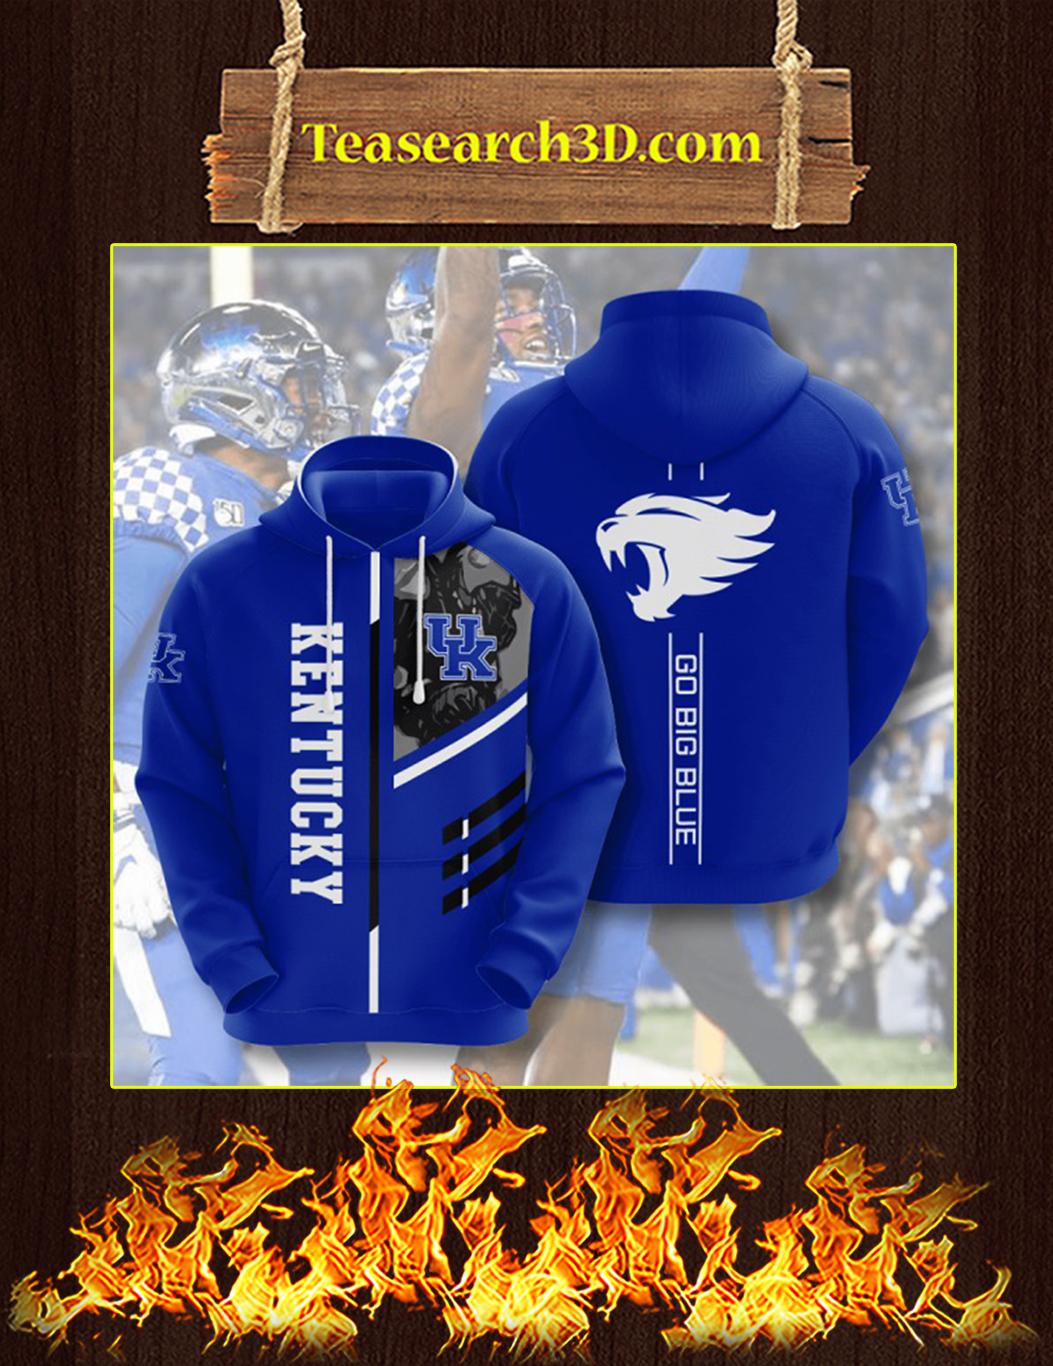 Go Big Blue Kentucky Wildcats 3D Hoodie Size M